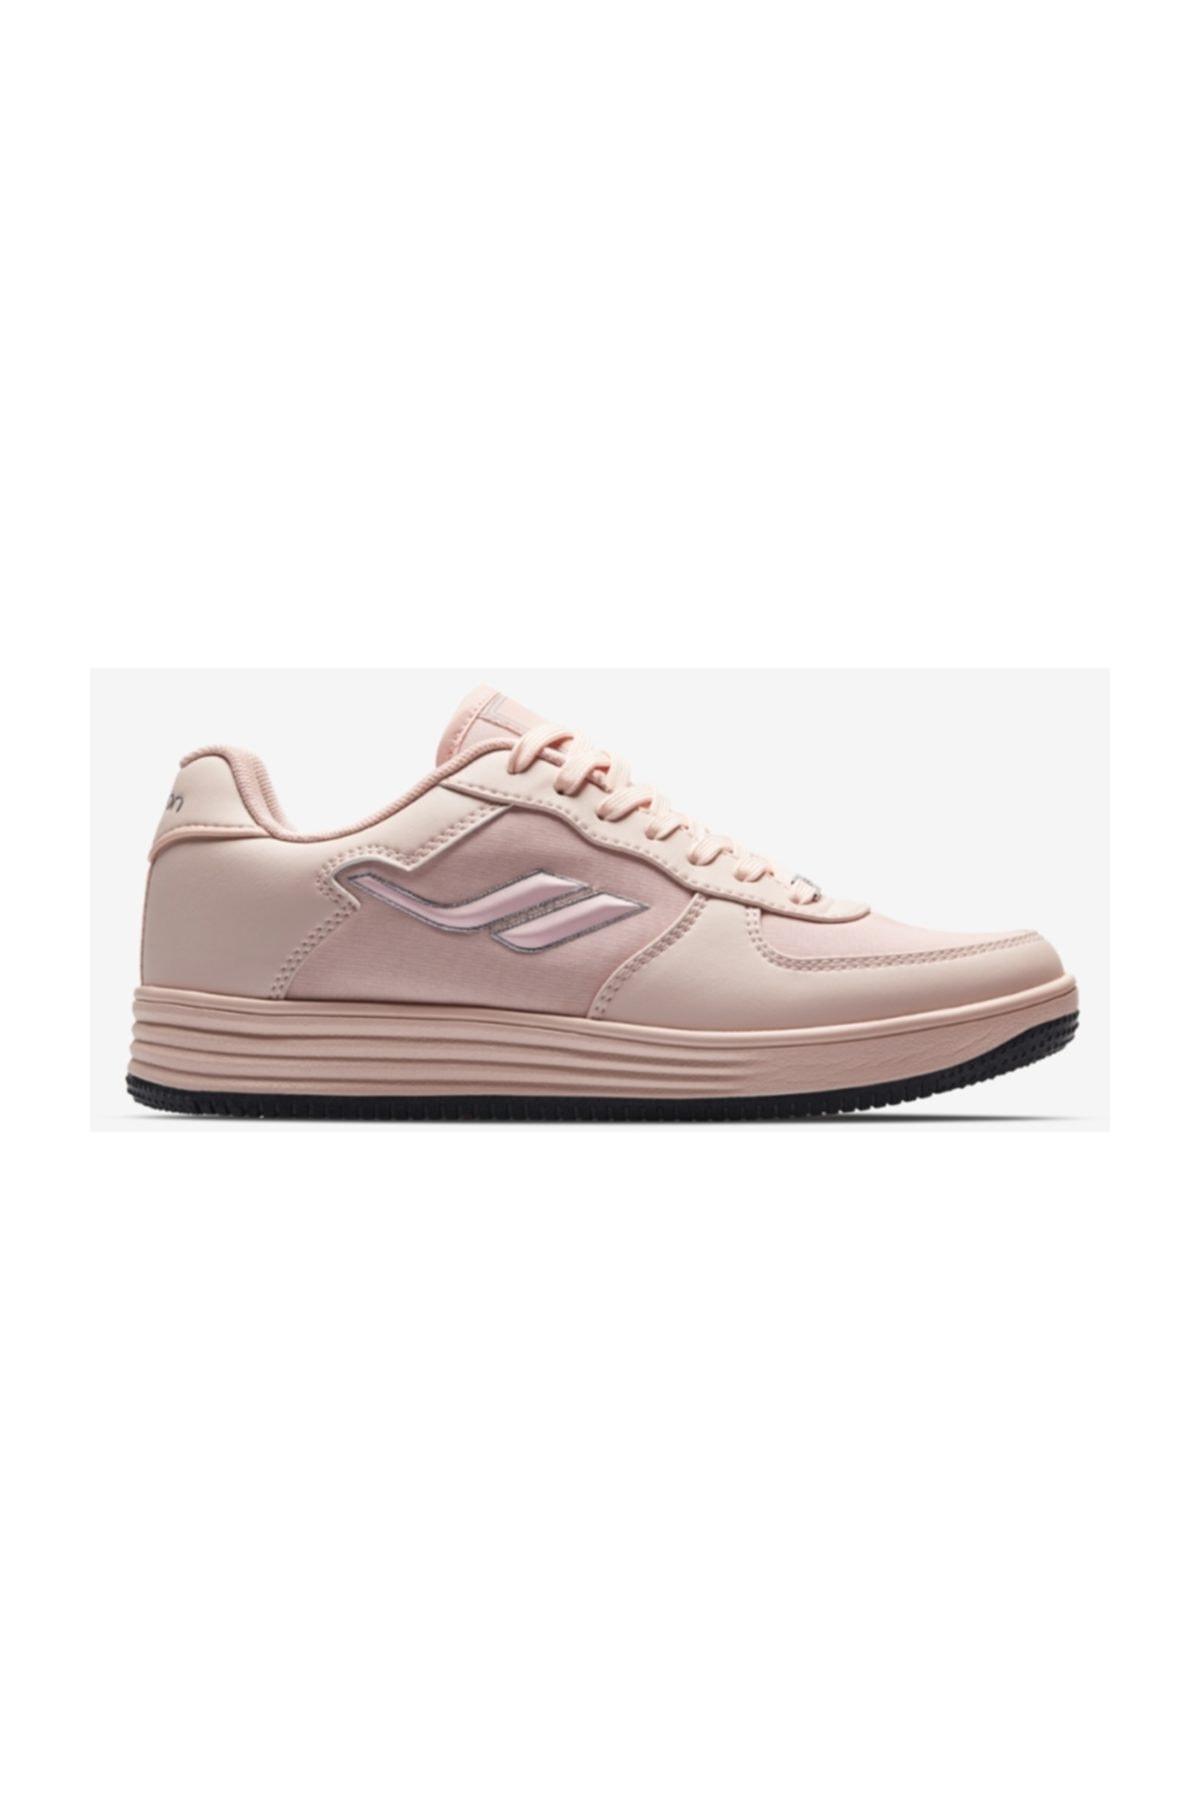 Lescon L-6616 Pudra Beyaz Bayan Sneaker Ayakkabı 1